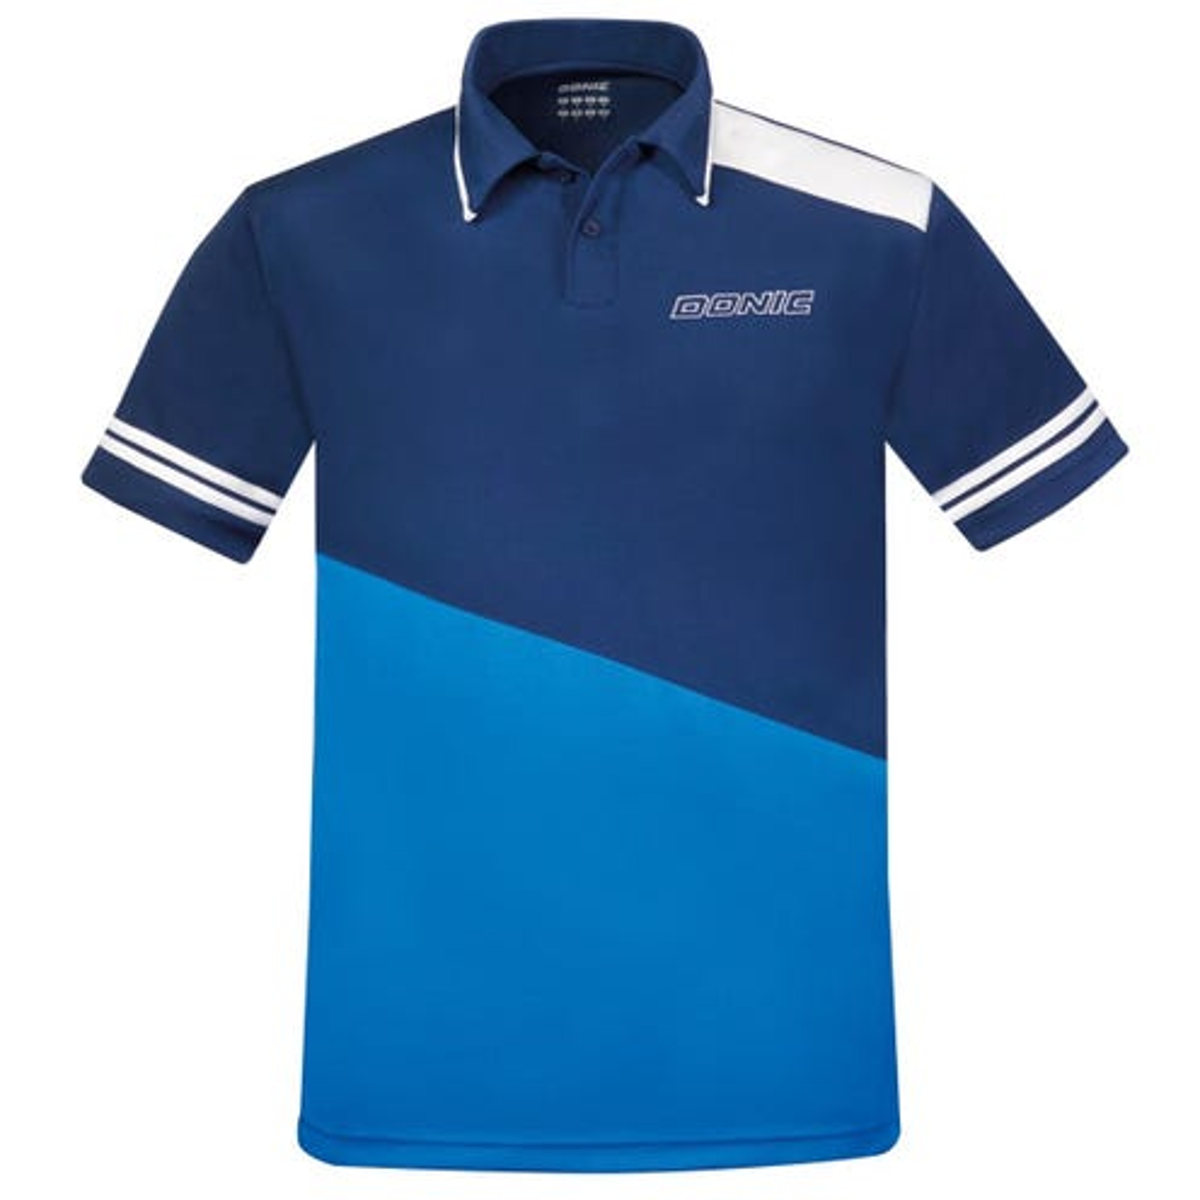 Donic Prime Royal Blue/Marine